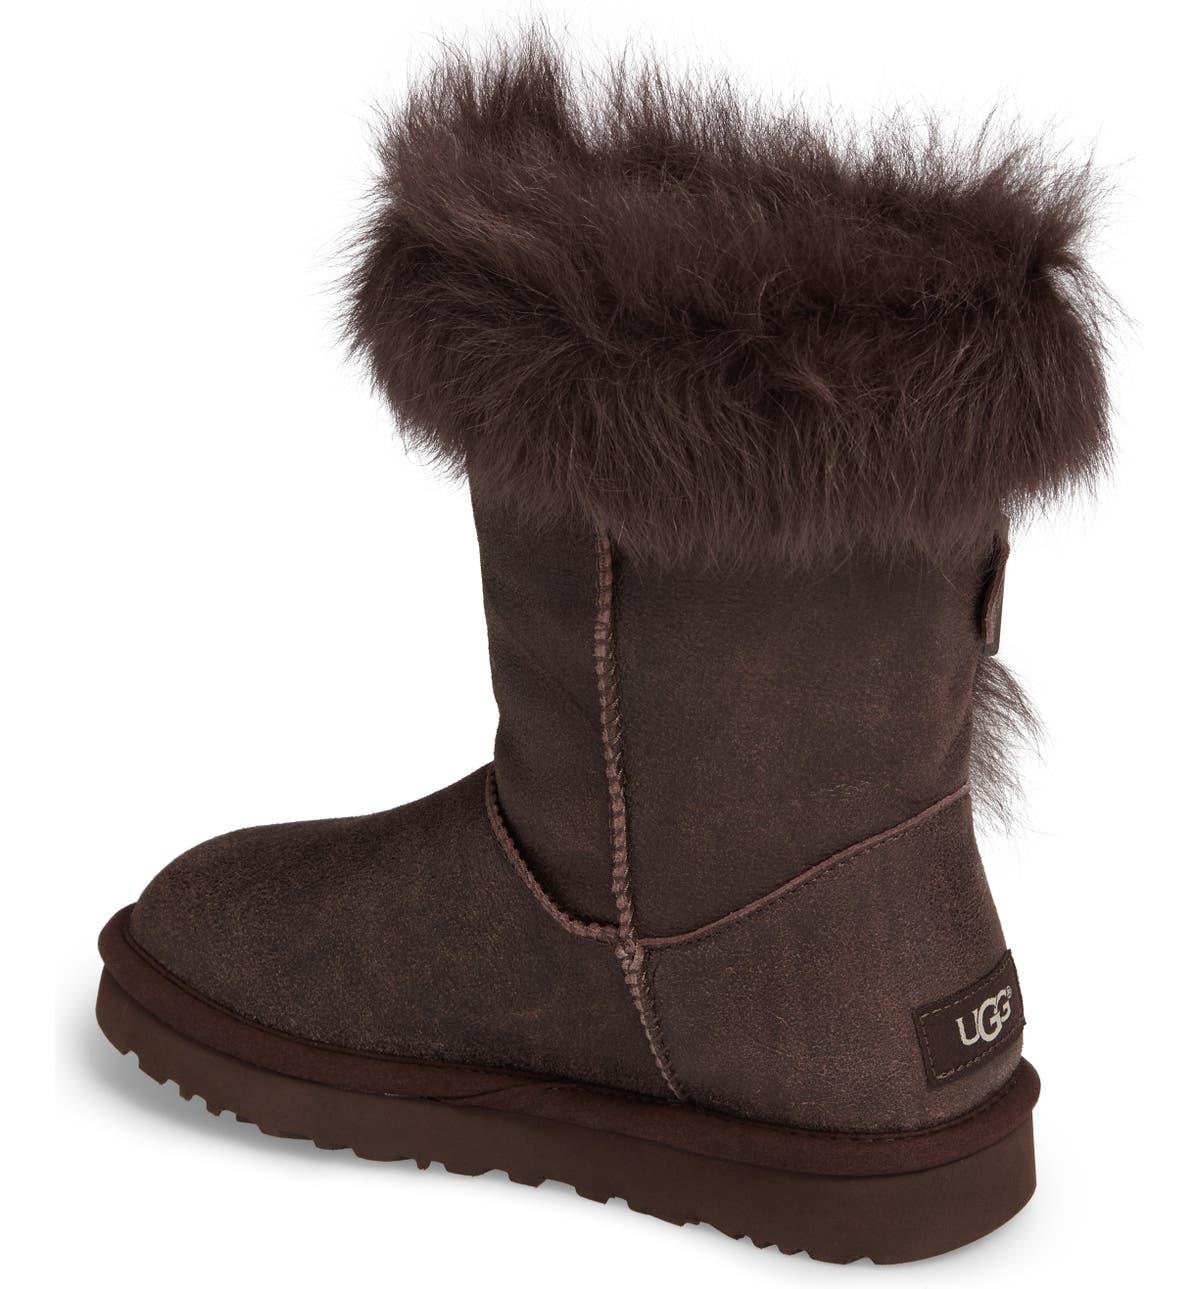 c6a0f300214 Deena Boot